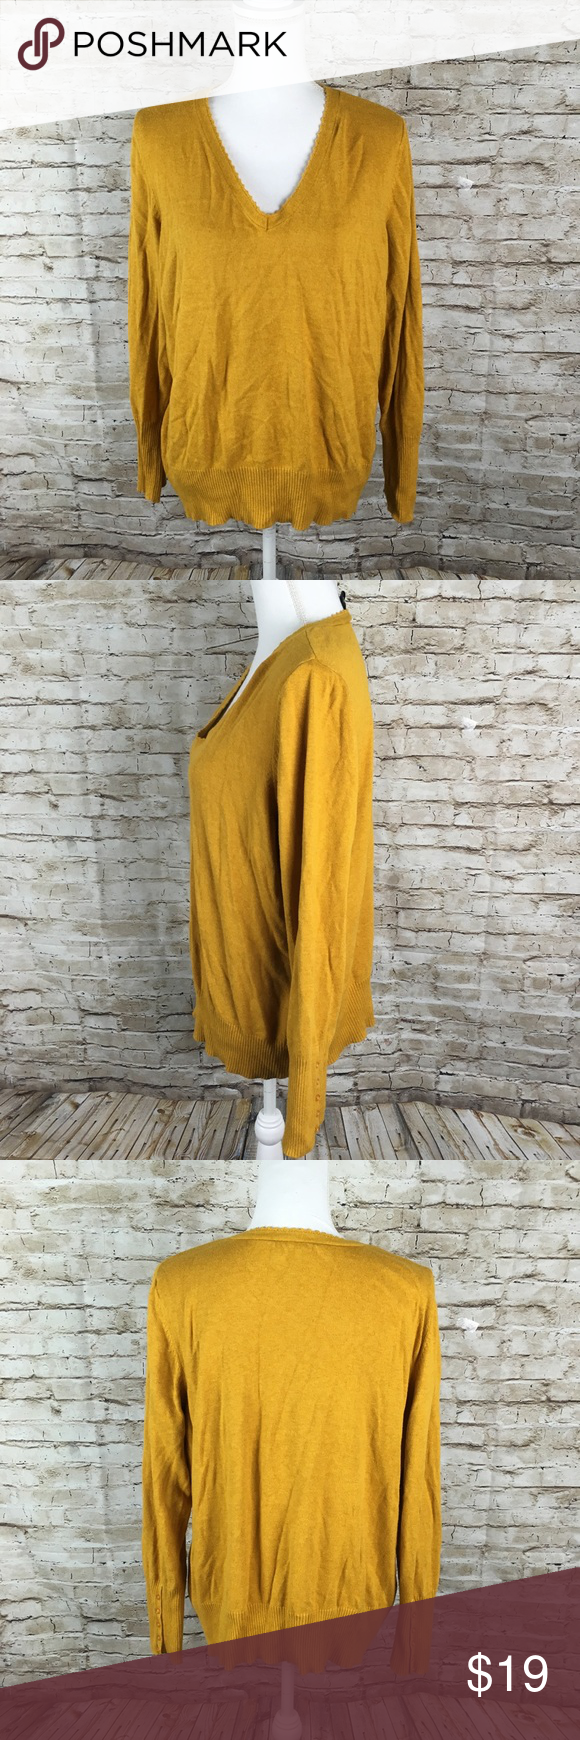 Lane Bryant mustard yellow pullover sweater 18/20 | Mustard and ...